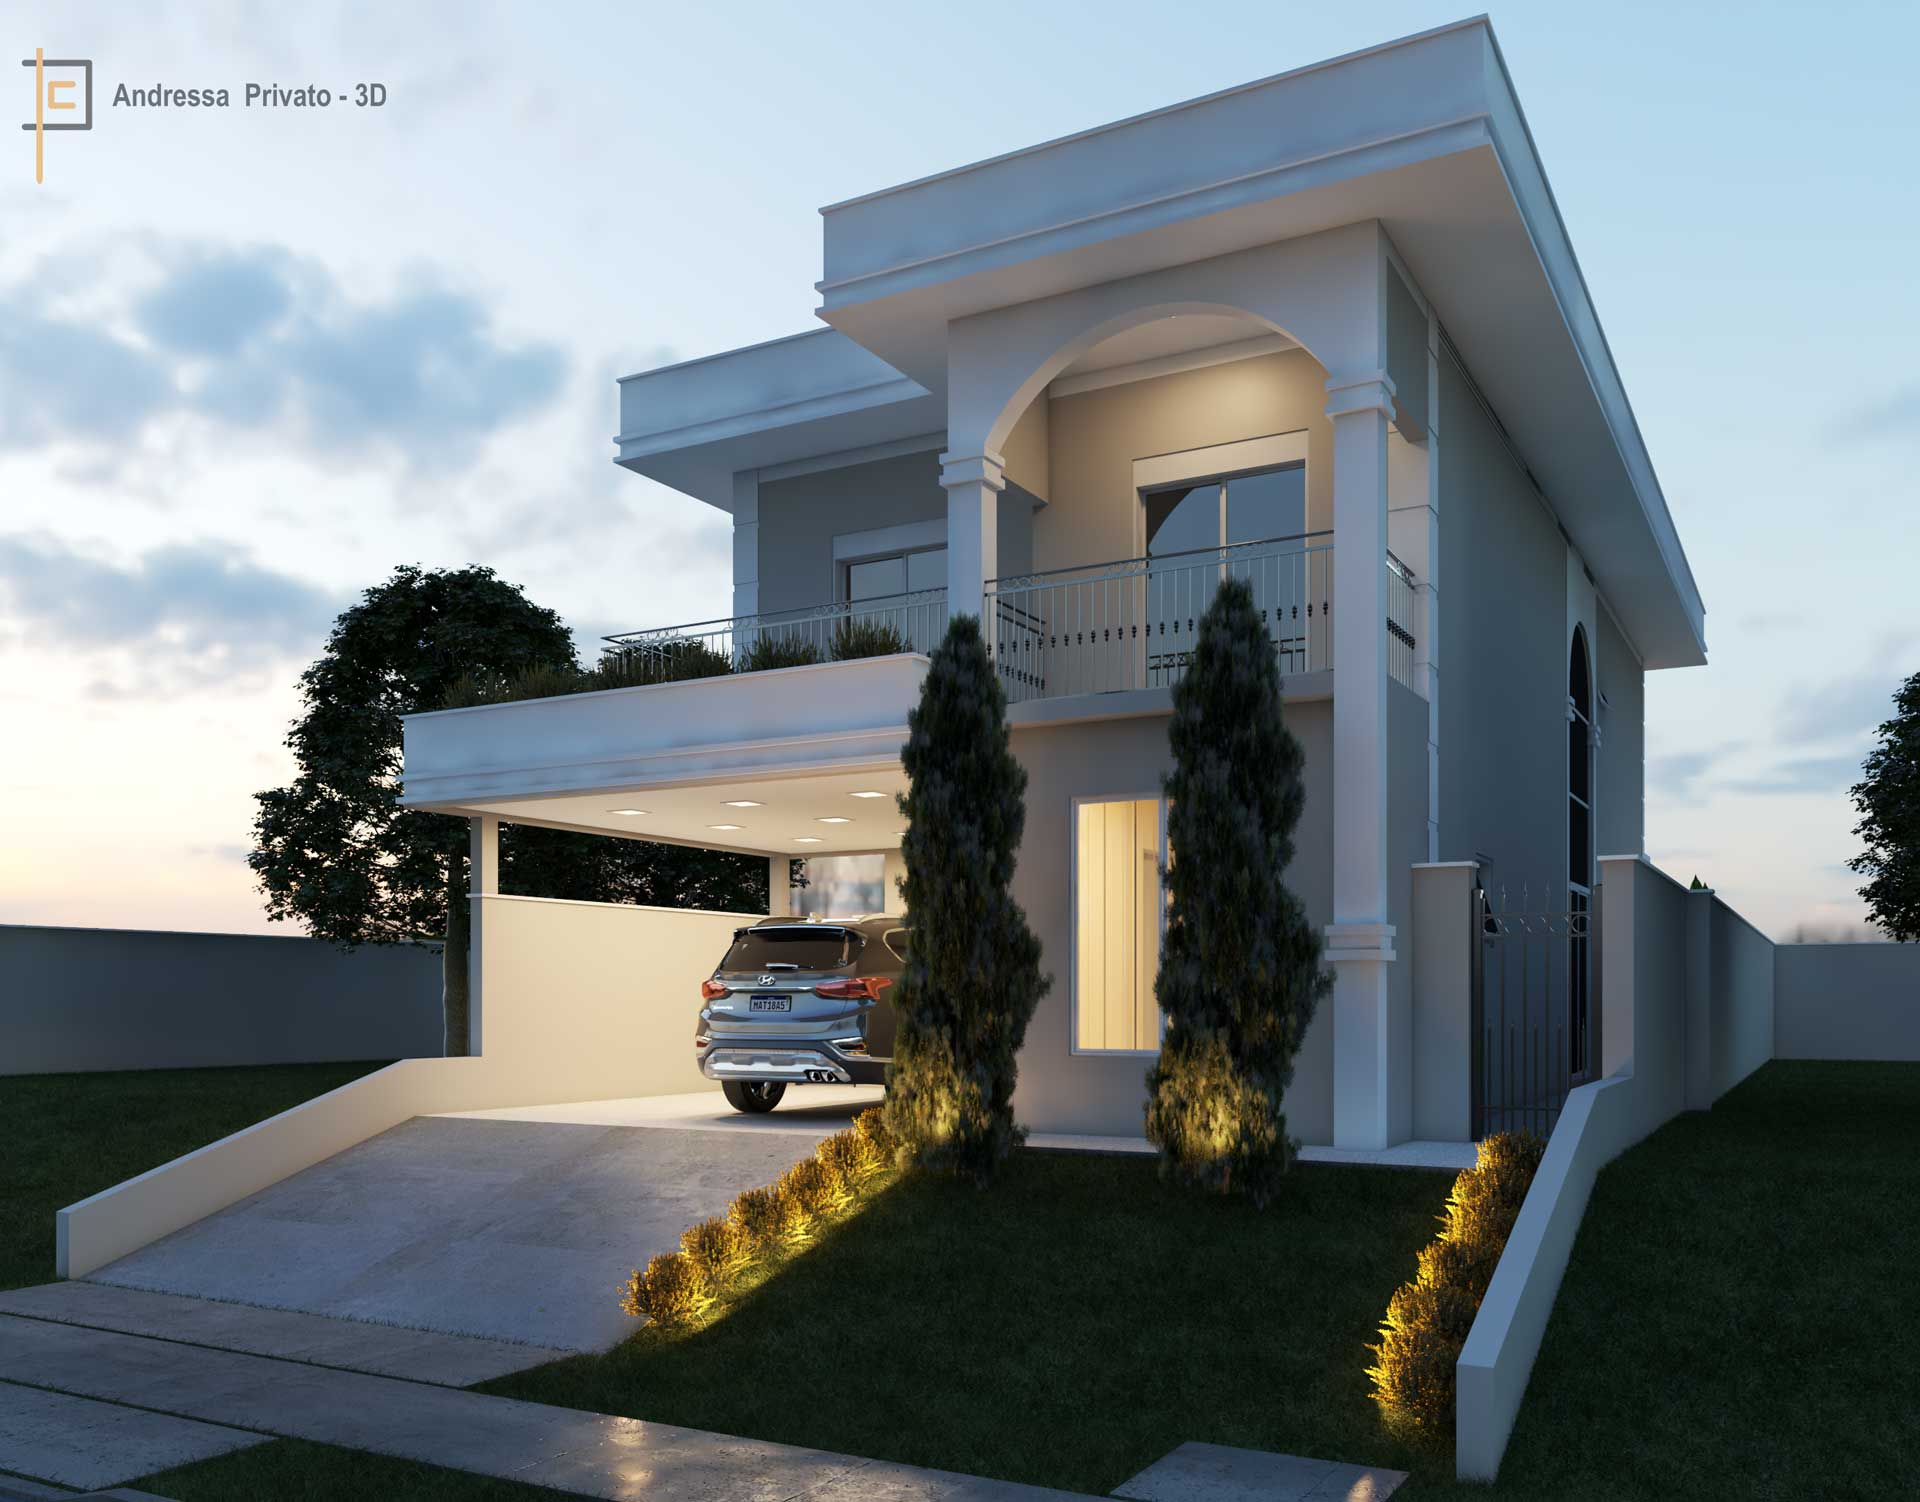 casa branca em modelagem 3d